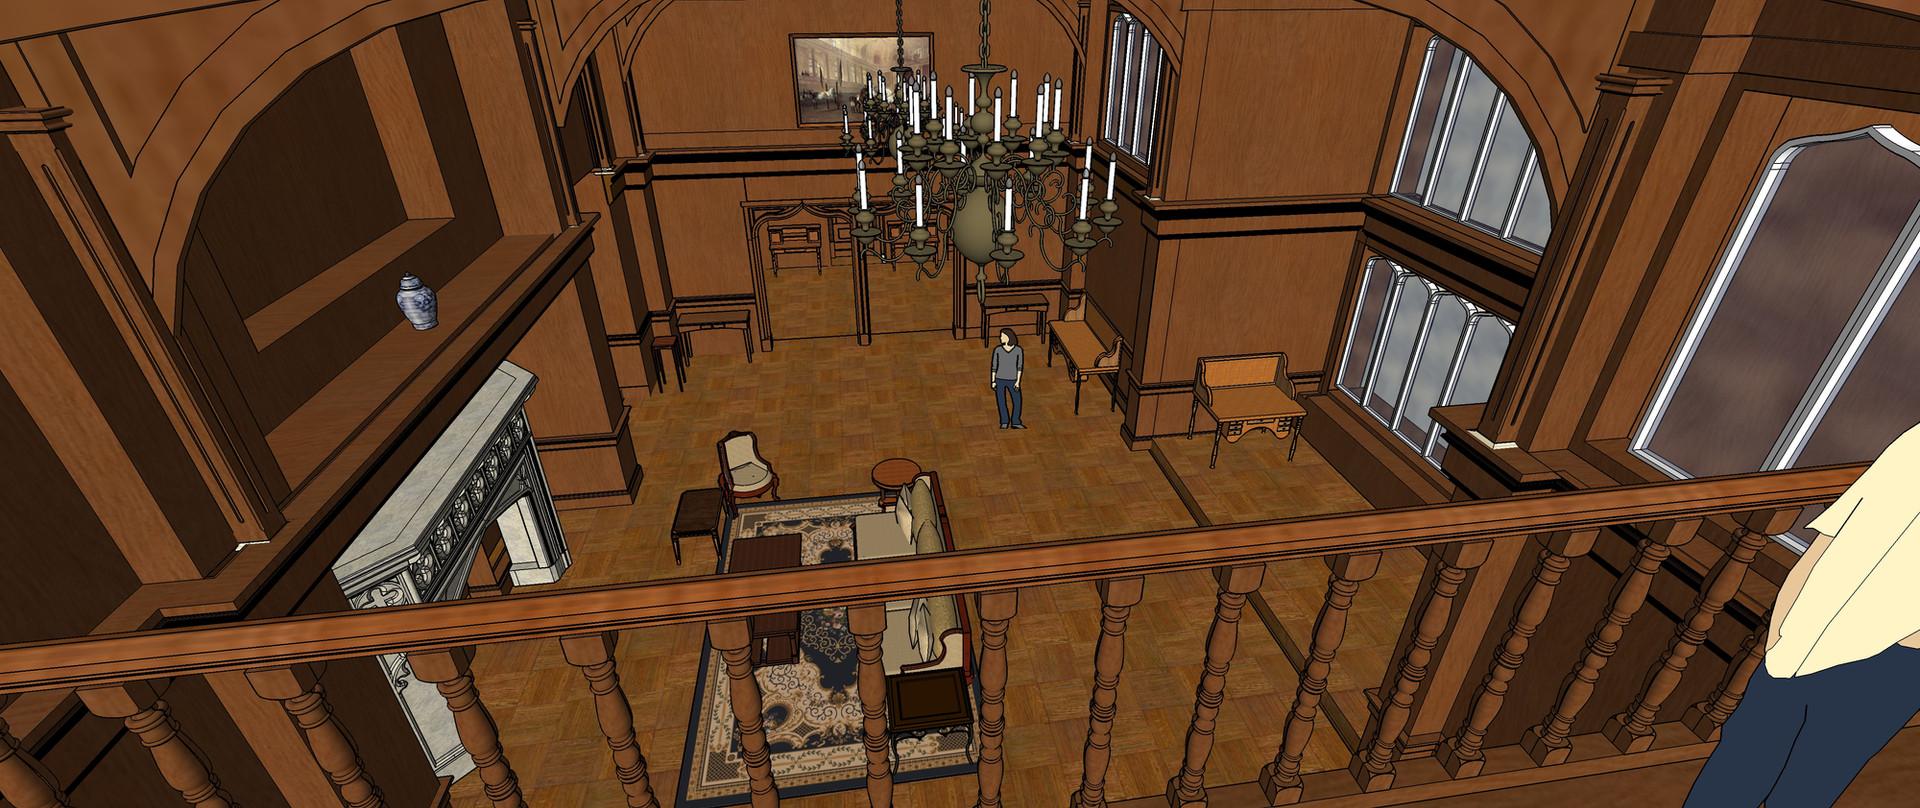 great hall 10.jpg